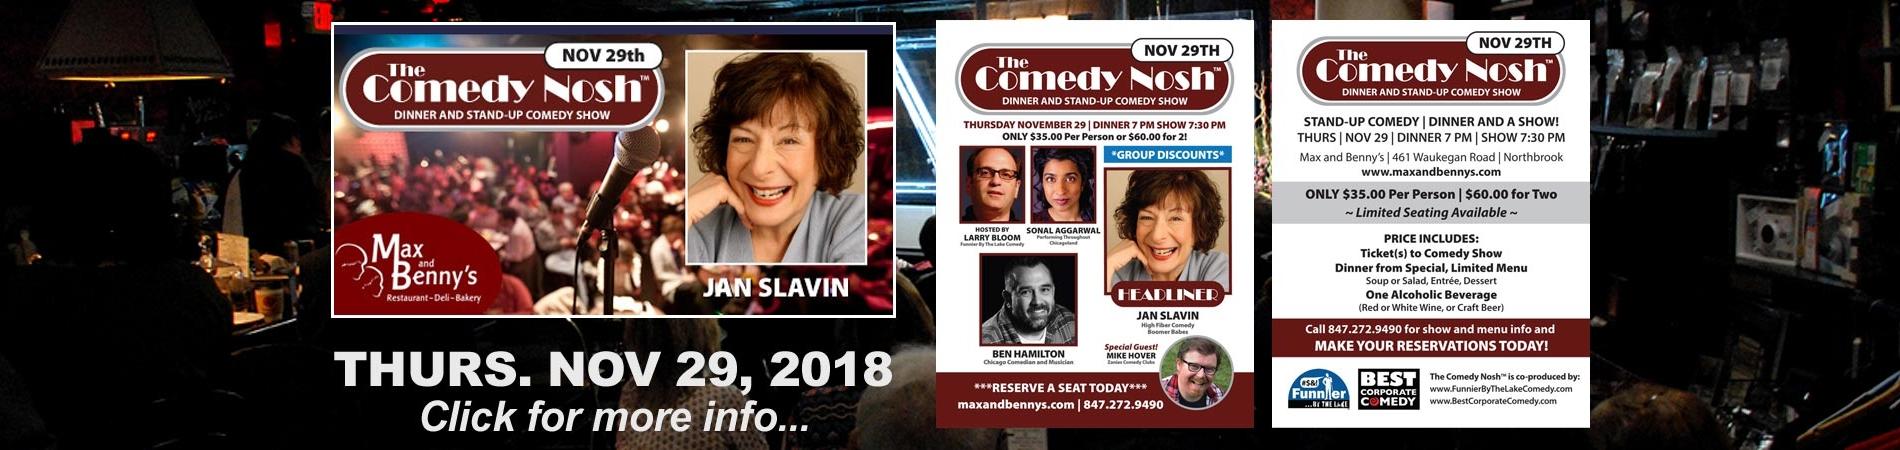 slider-comedynosh-11-2018